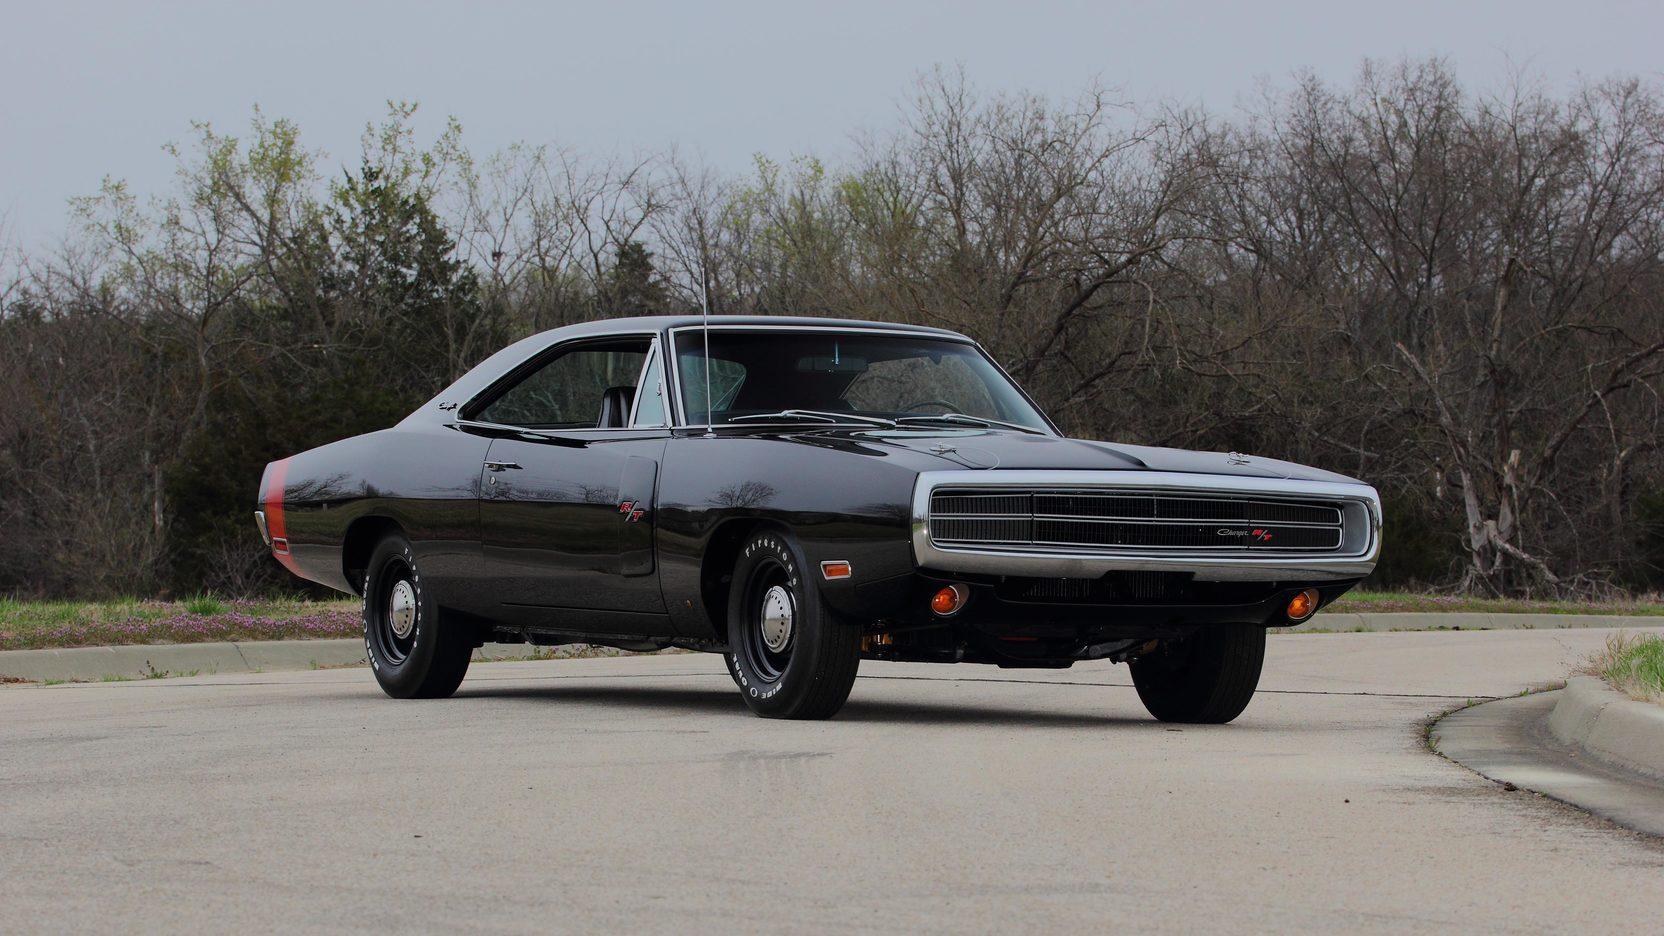 70 Rt Pack 440 Dodge Six Challenger